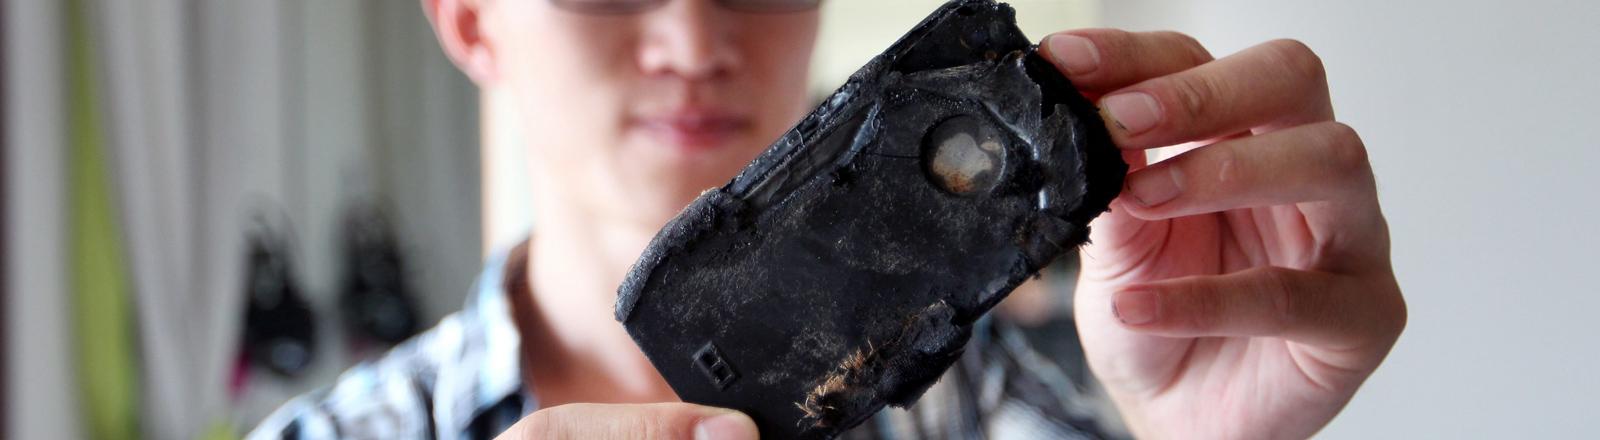 verbranntes Handy